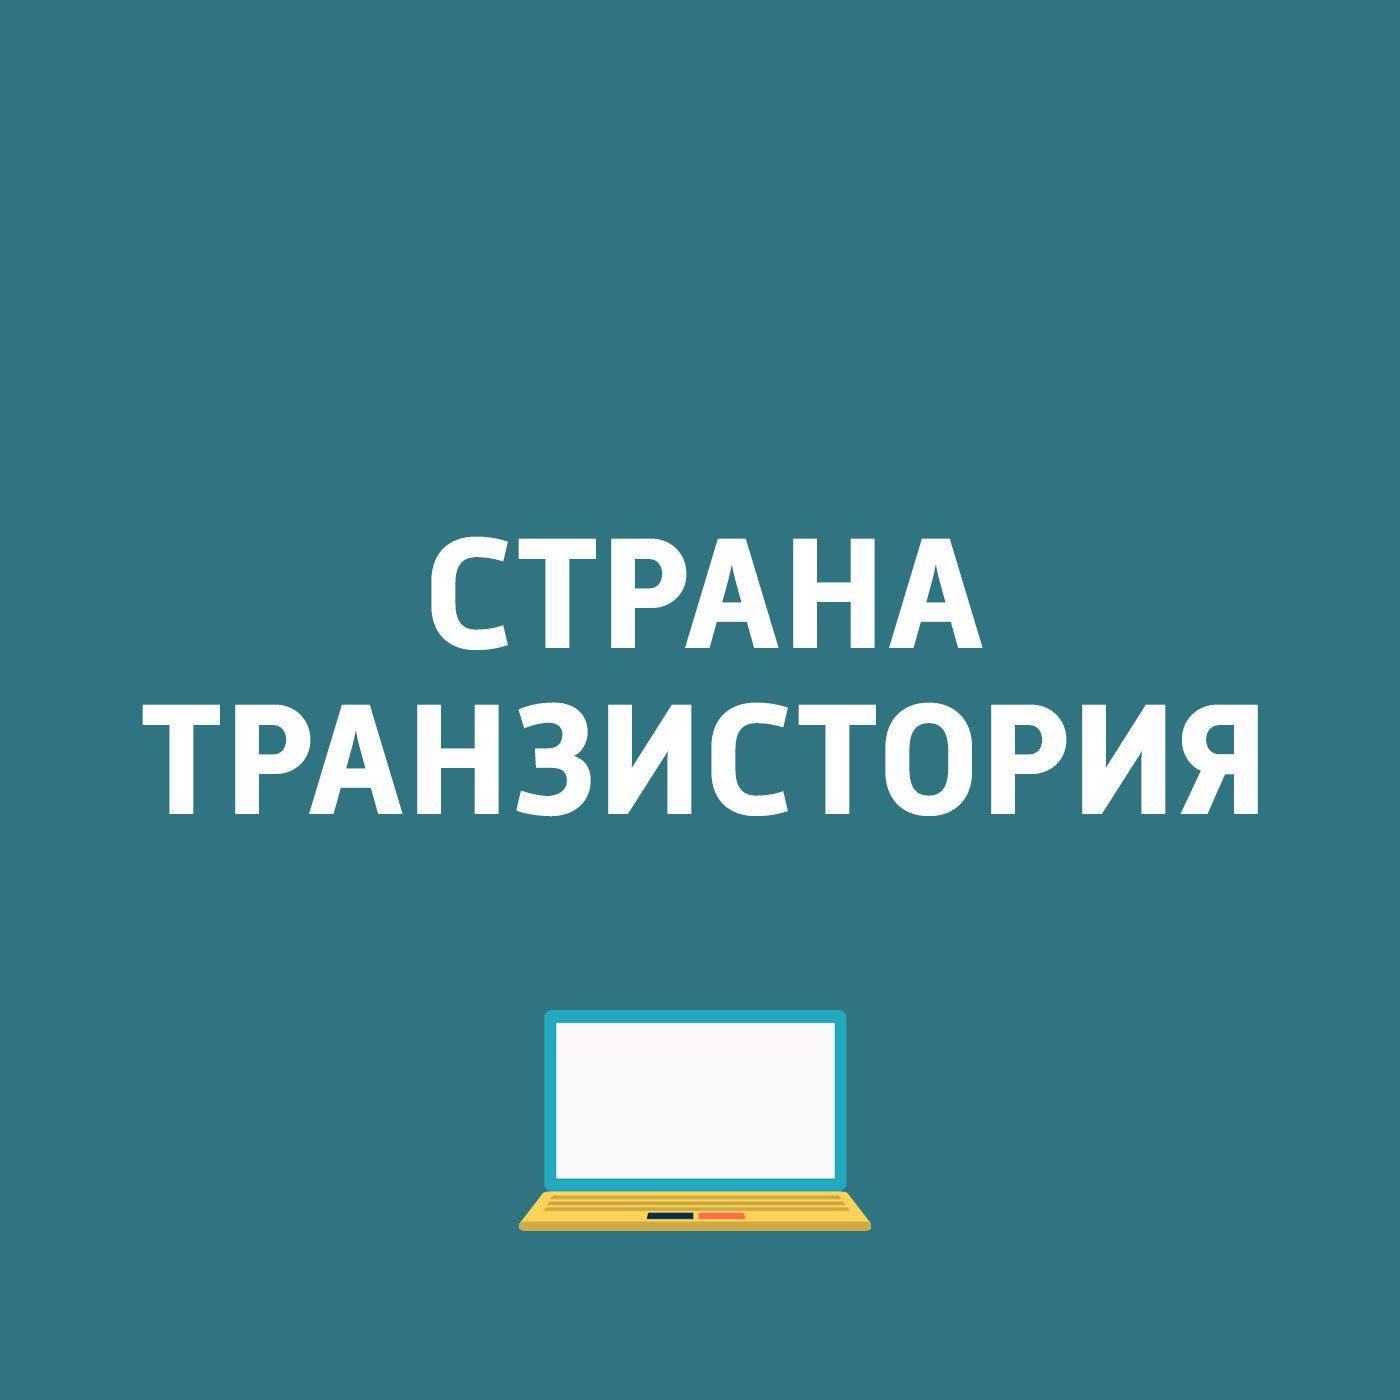 Картаев Павел Energizer PowerMax P18K Pro от компании Avenir Telecom цена и фото